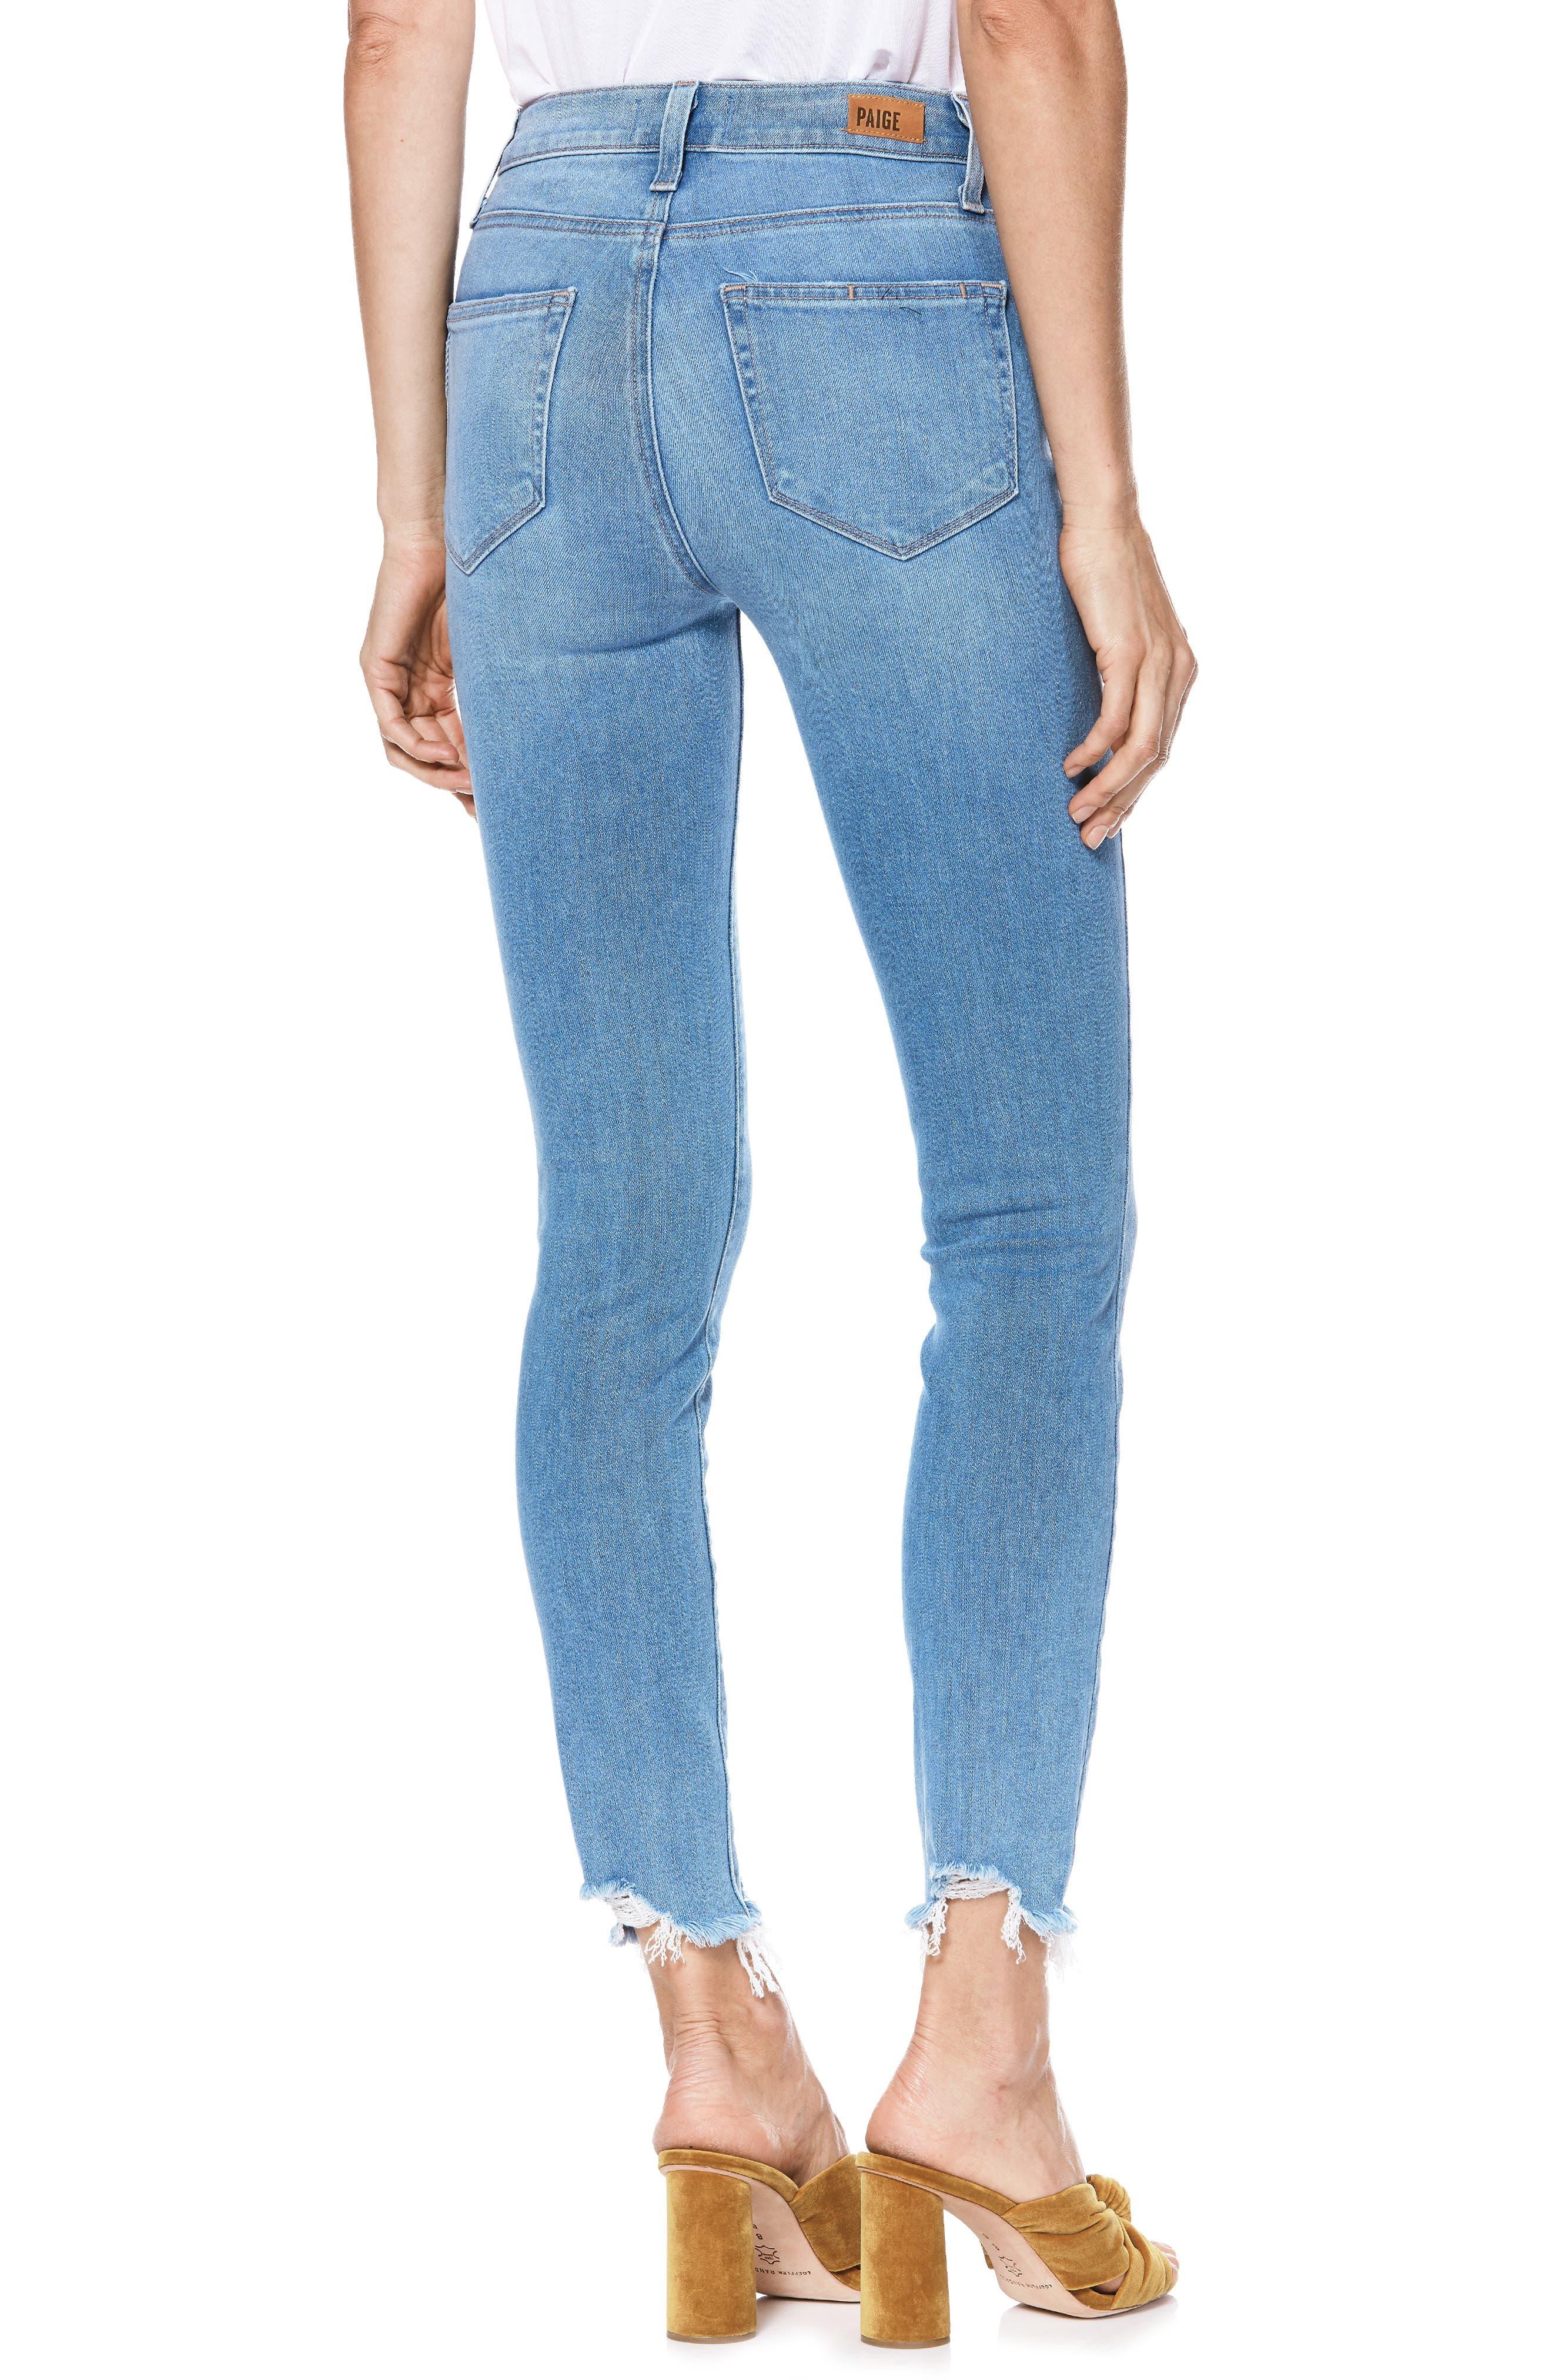 Transcend Vintage - Hoxton High Waist Ripped Crop Skinny Jeans,                             Alternate thumbnail 2, color,                             ALAMEDA